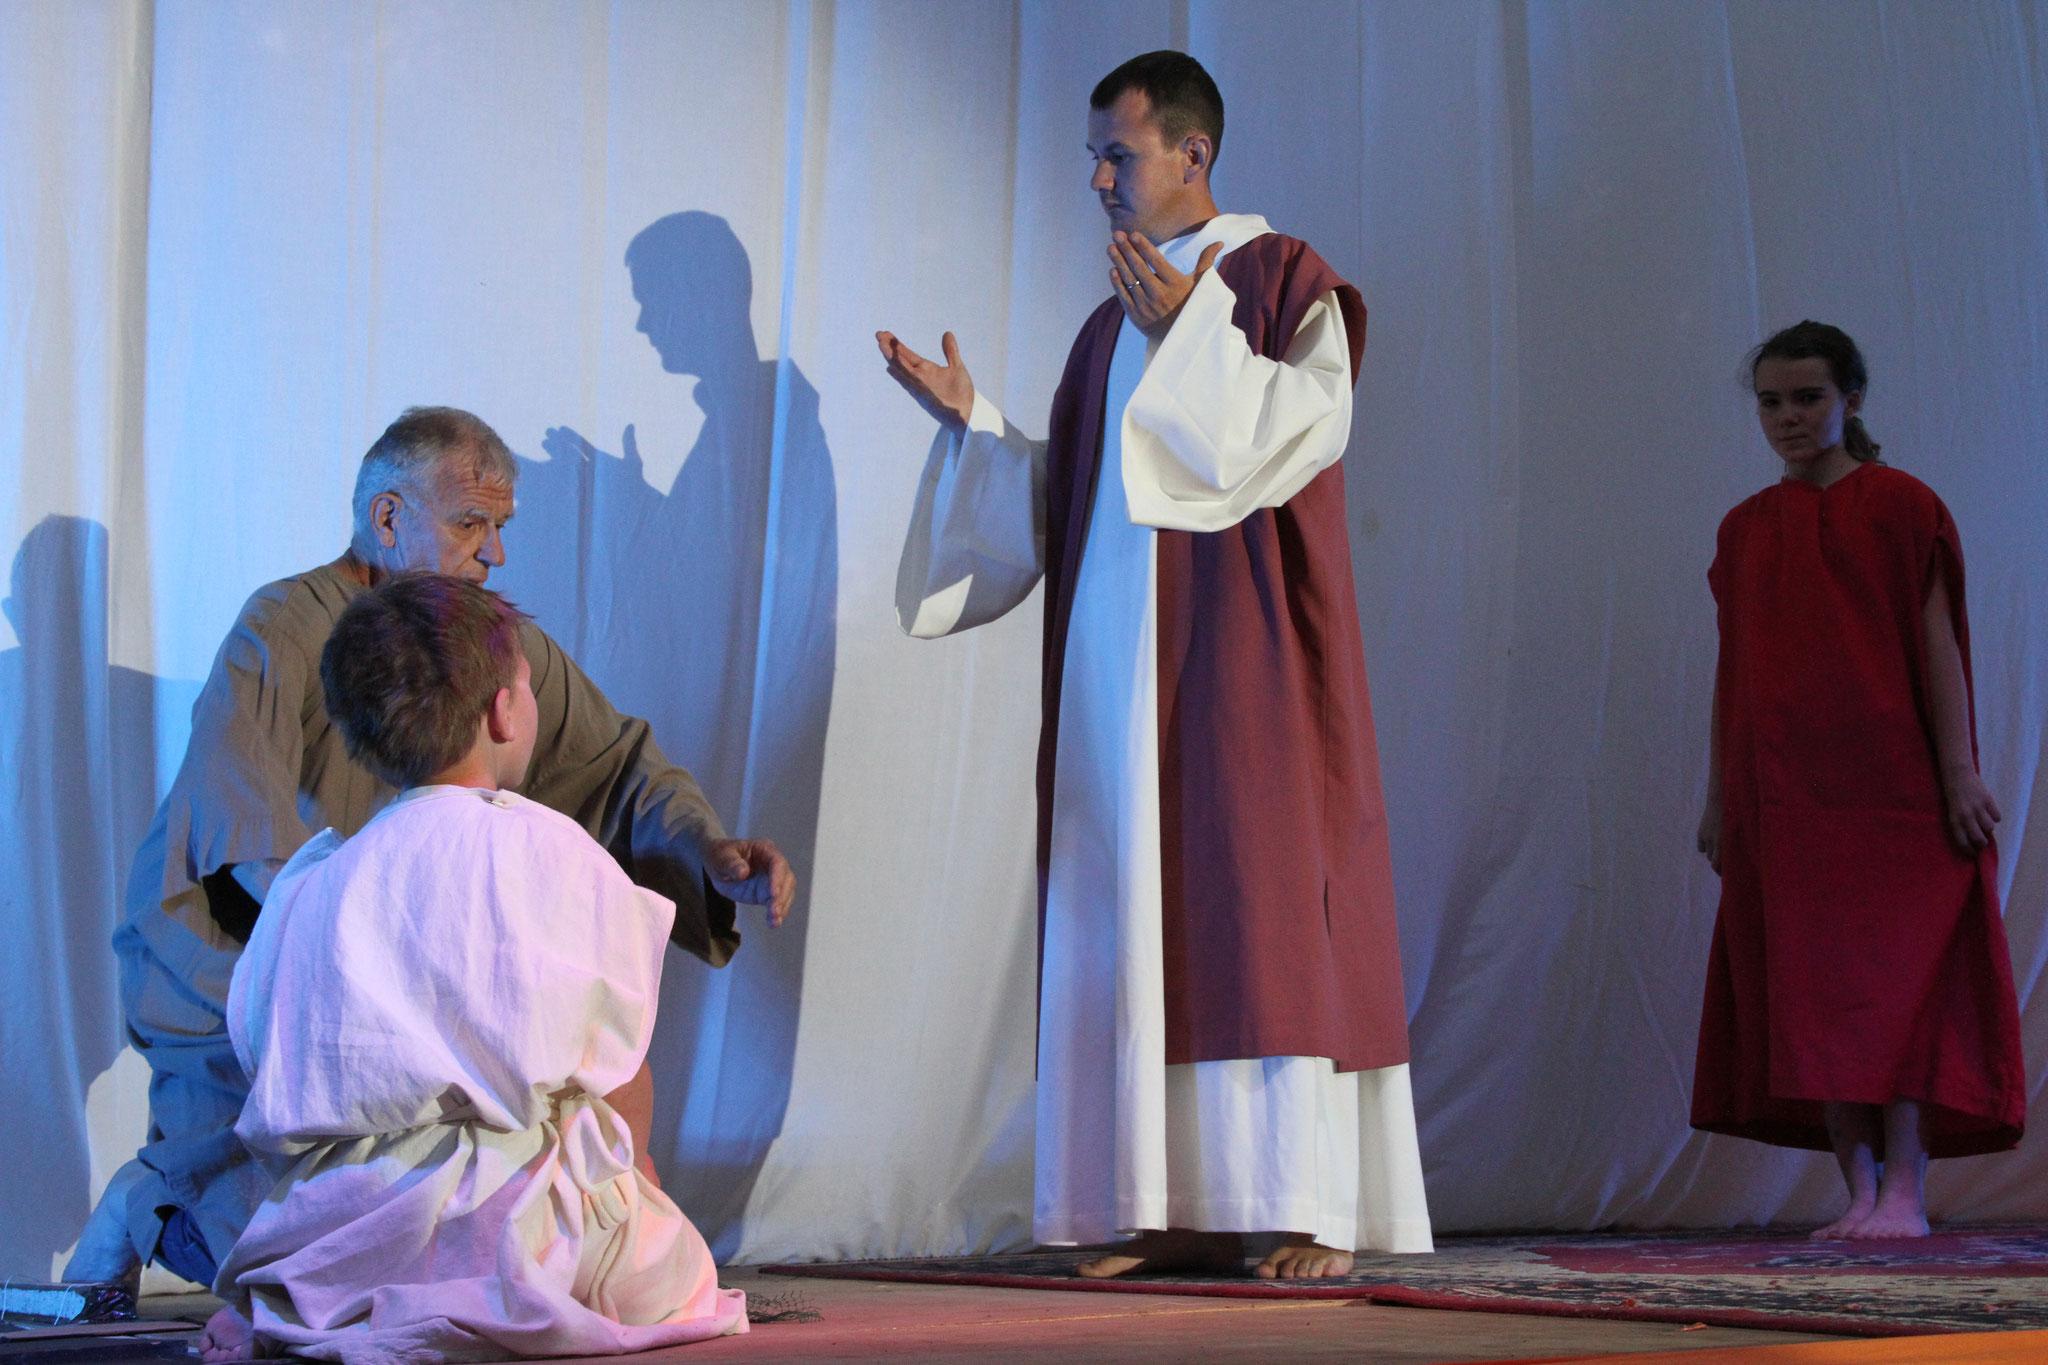 L'appel des disciples (c) JDR